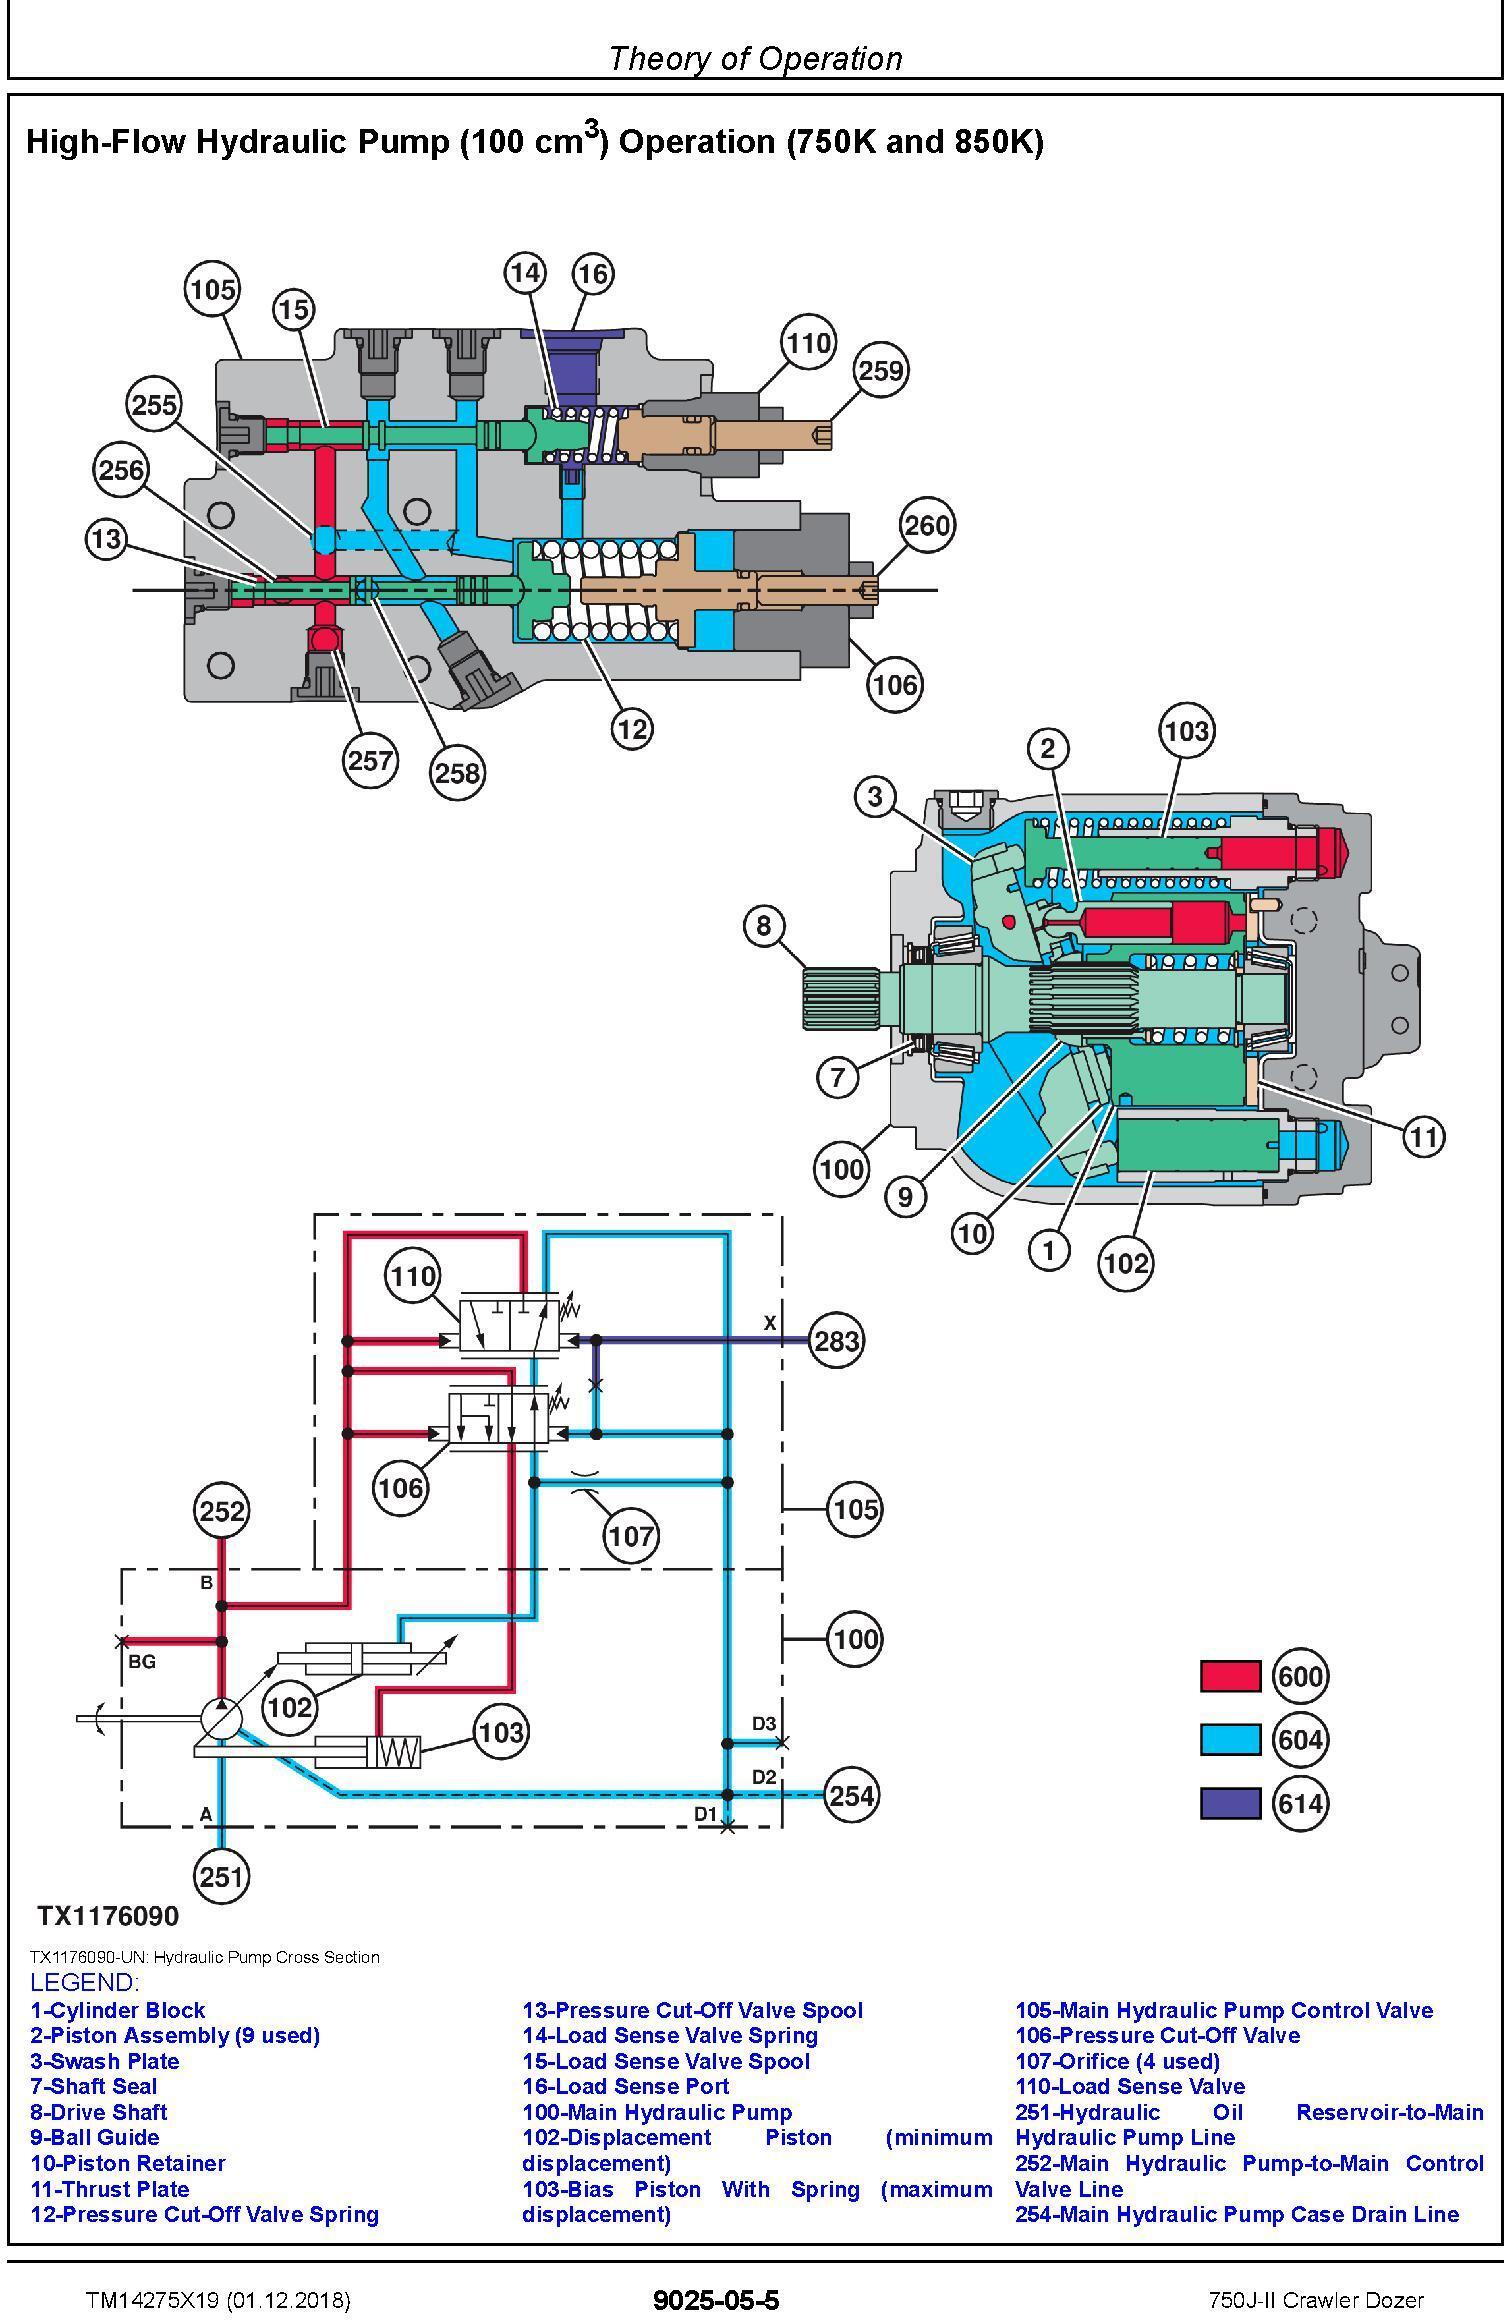 John Deere 750J-II (SN. D000001-) Crawler Dozer Operation & Test Technical Manual (TM14275X19) - 2